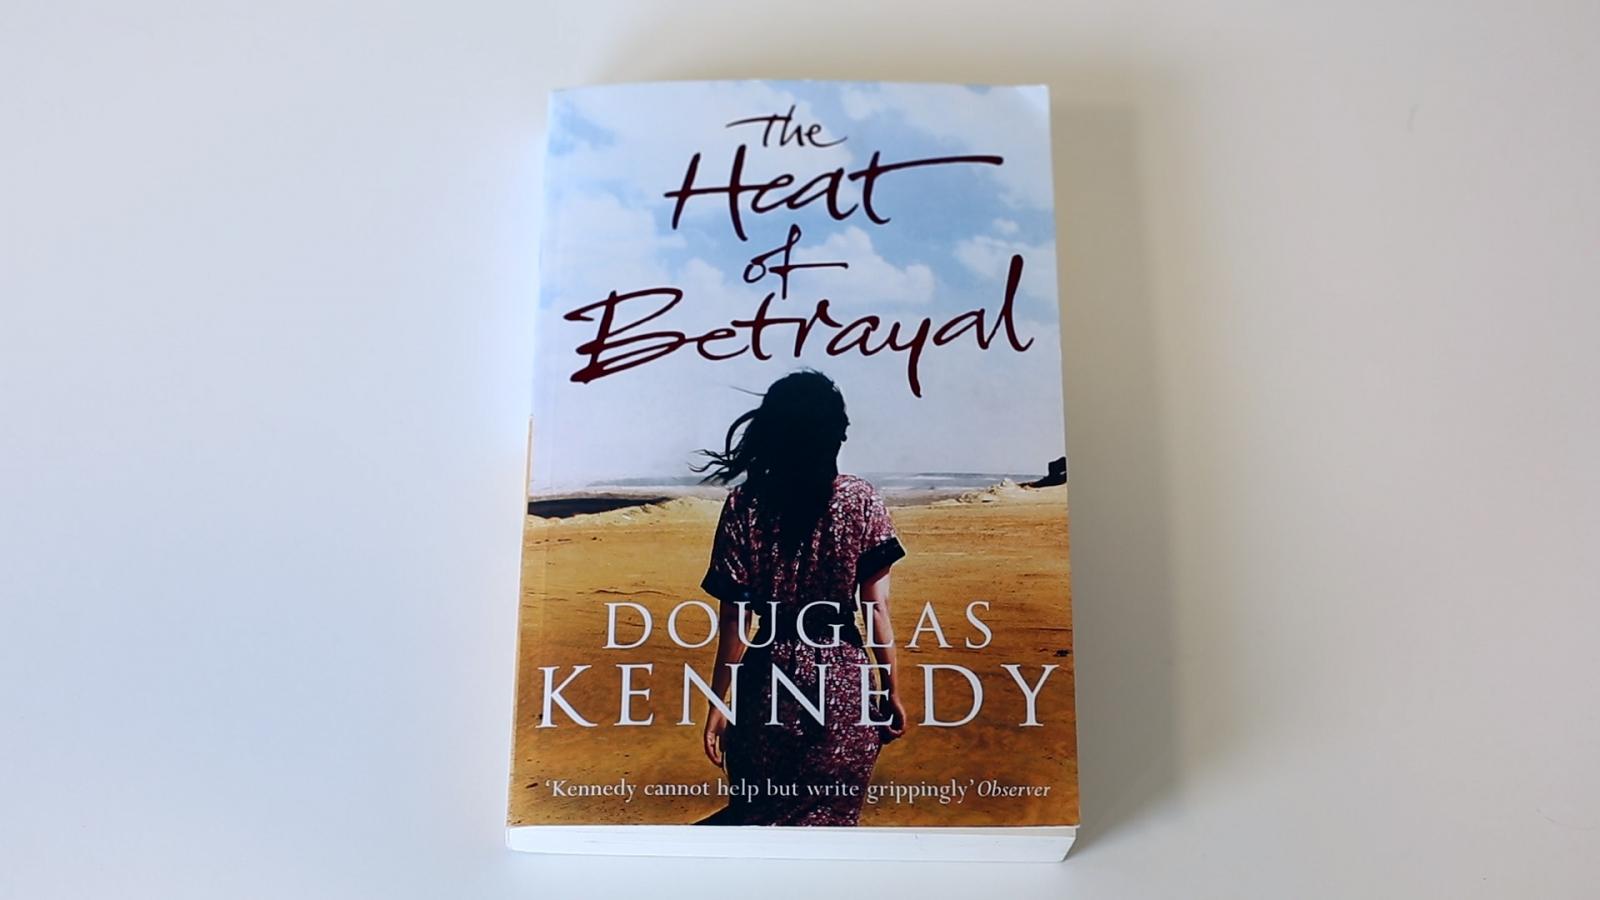 The Heat of Betrayal novel